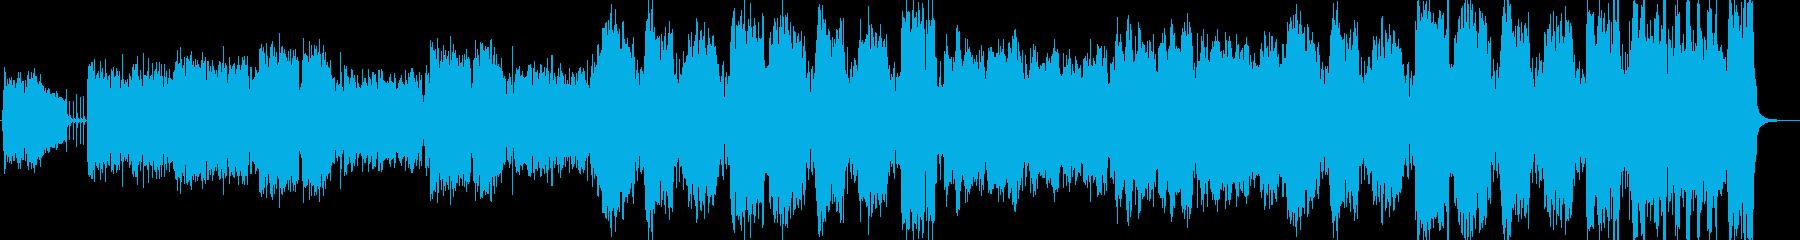 Waltzの再生済みの波形